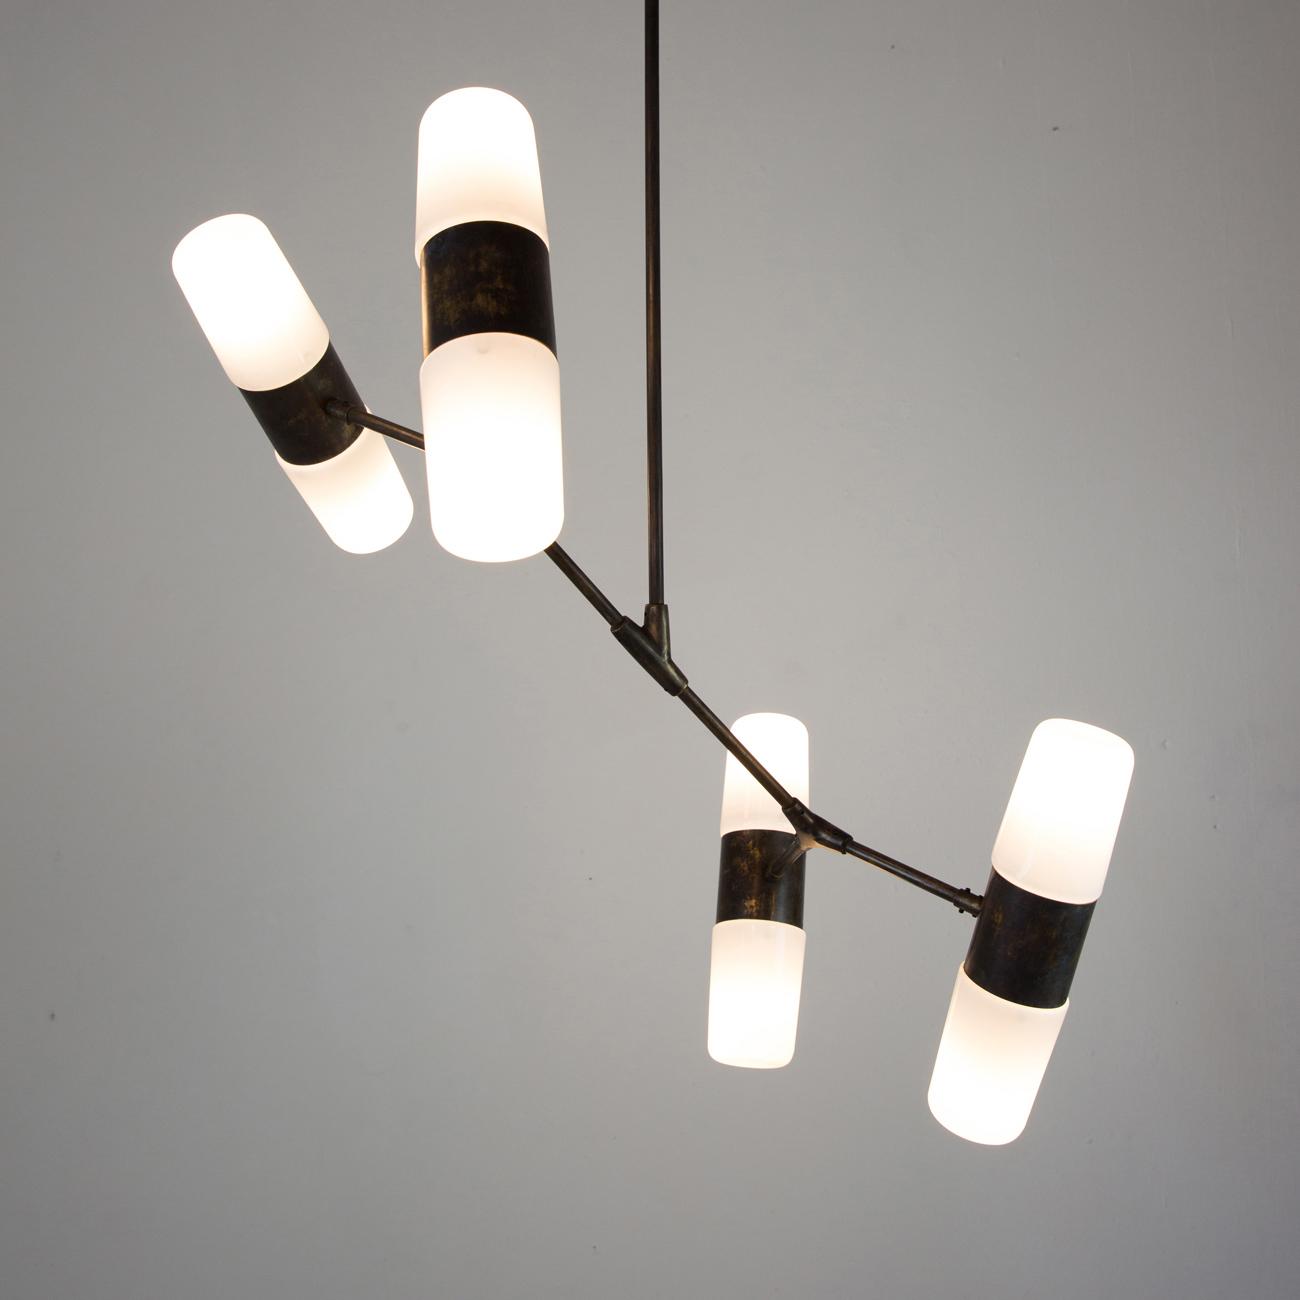 Pendant-Model-01-B-lit-whole2.jpg